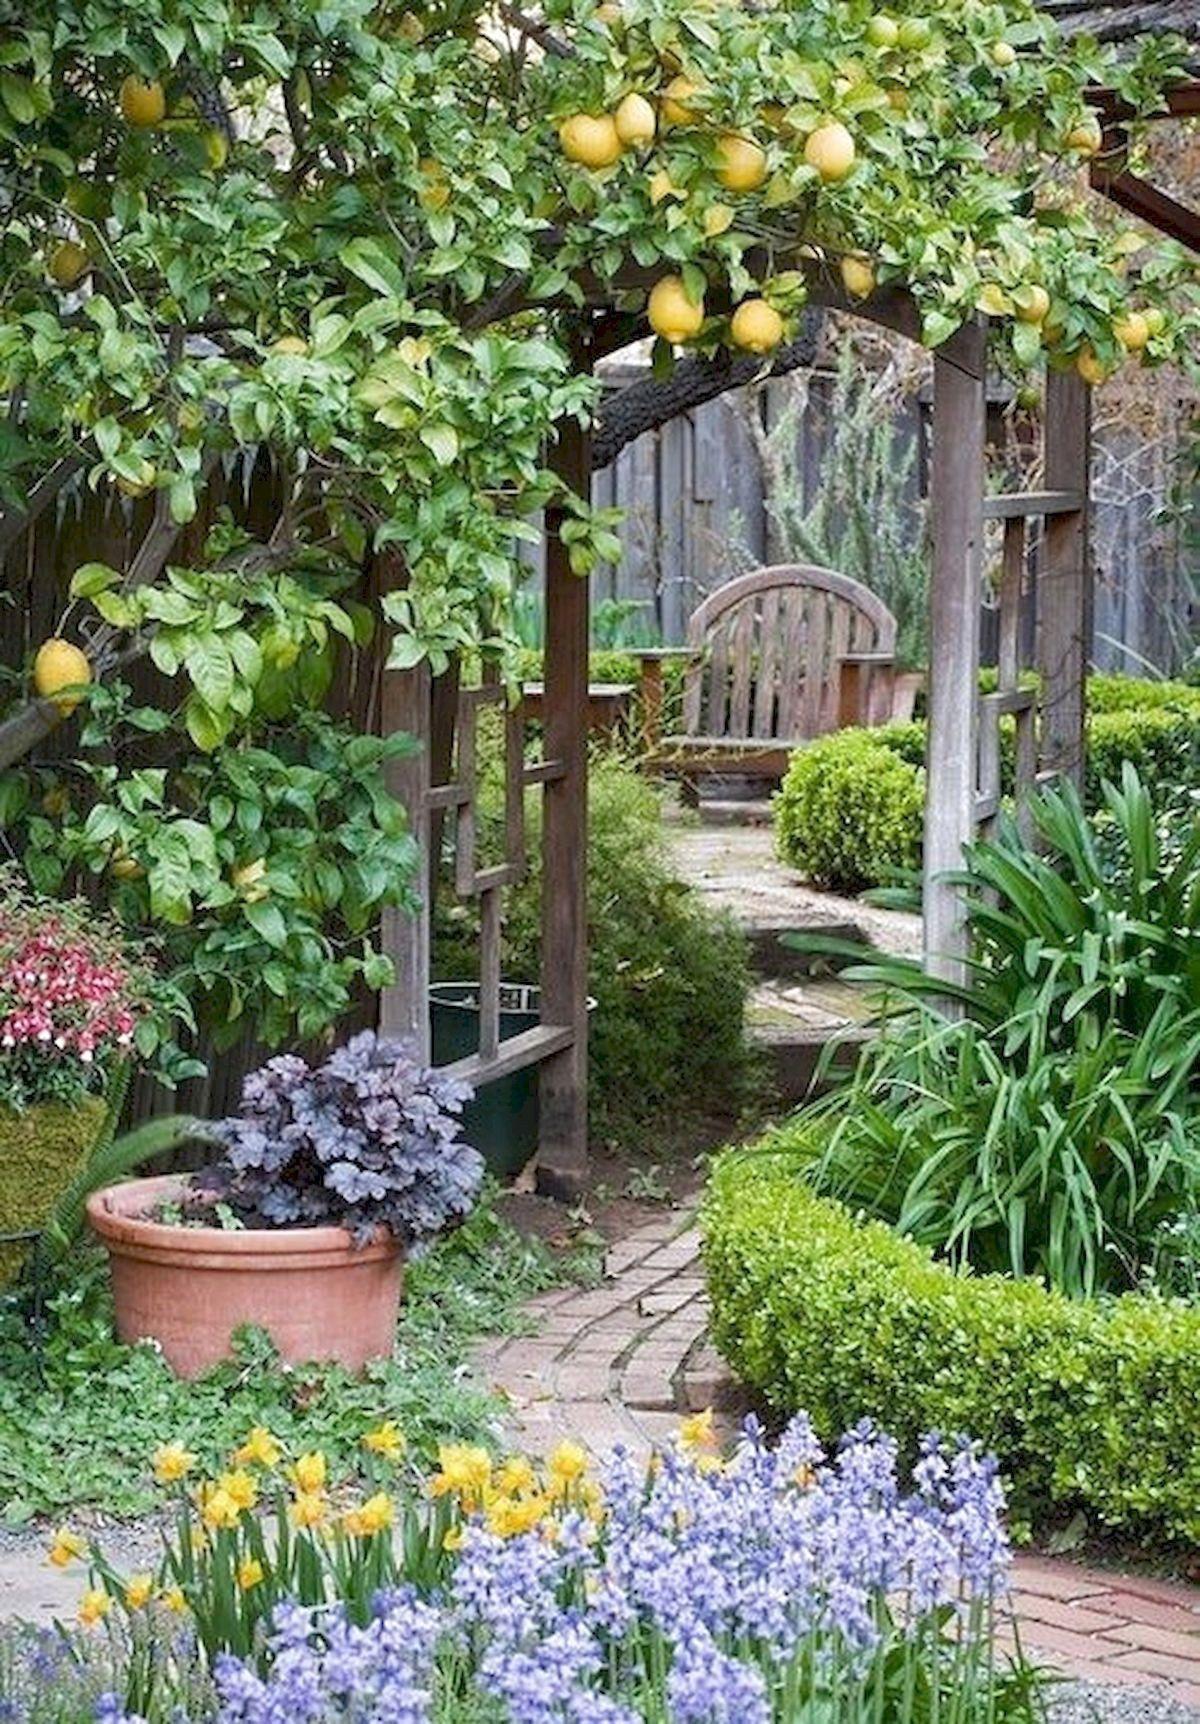 45 Beautiful Pinterest Garden Decor Ideas In 2020 Tropical Garden Design Low Maintenance Garden Design Small Garden Design